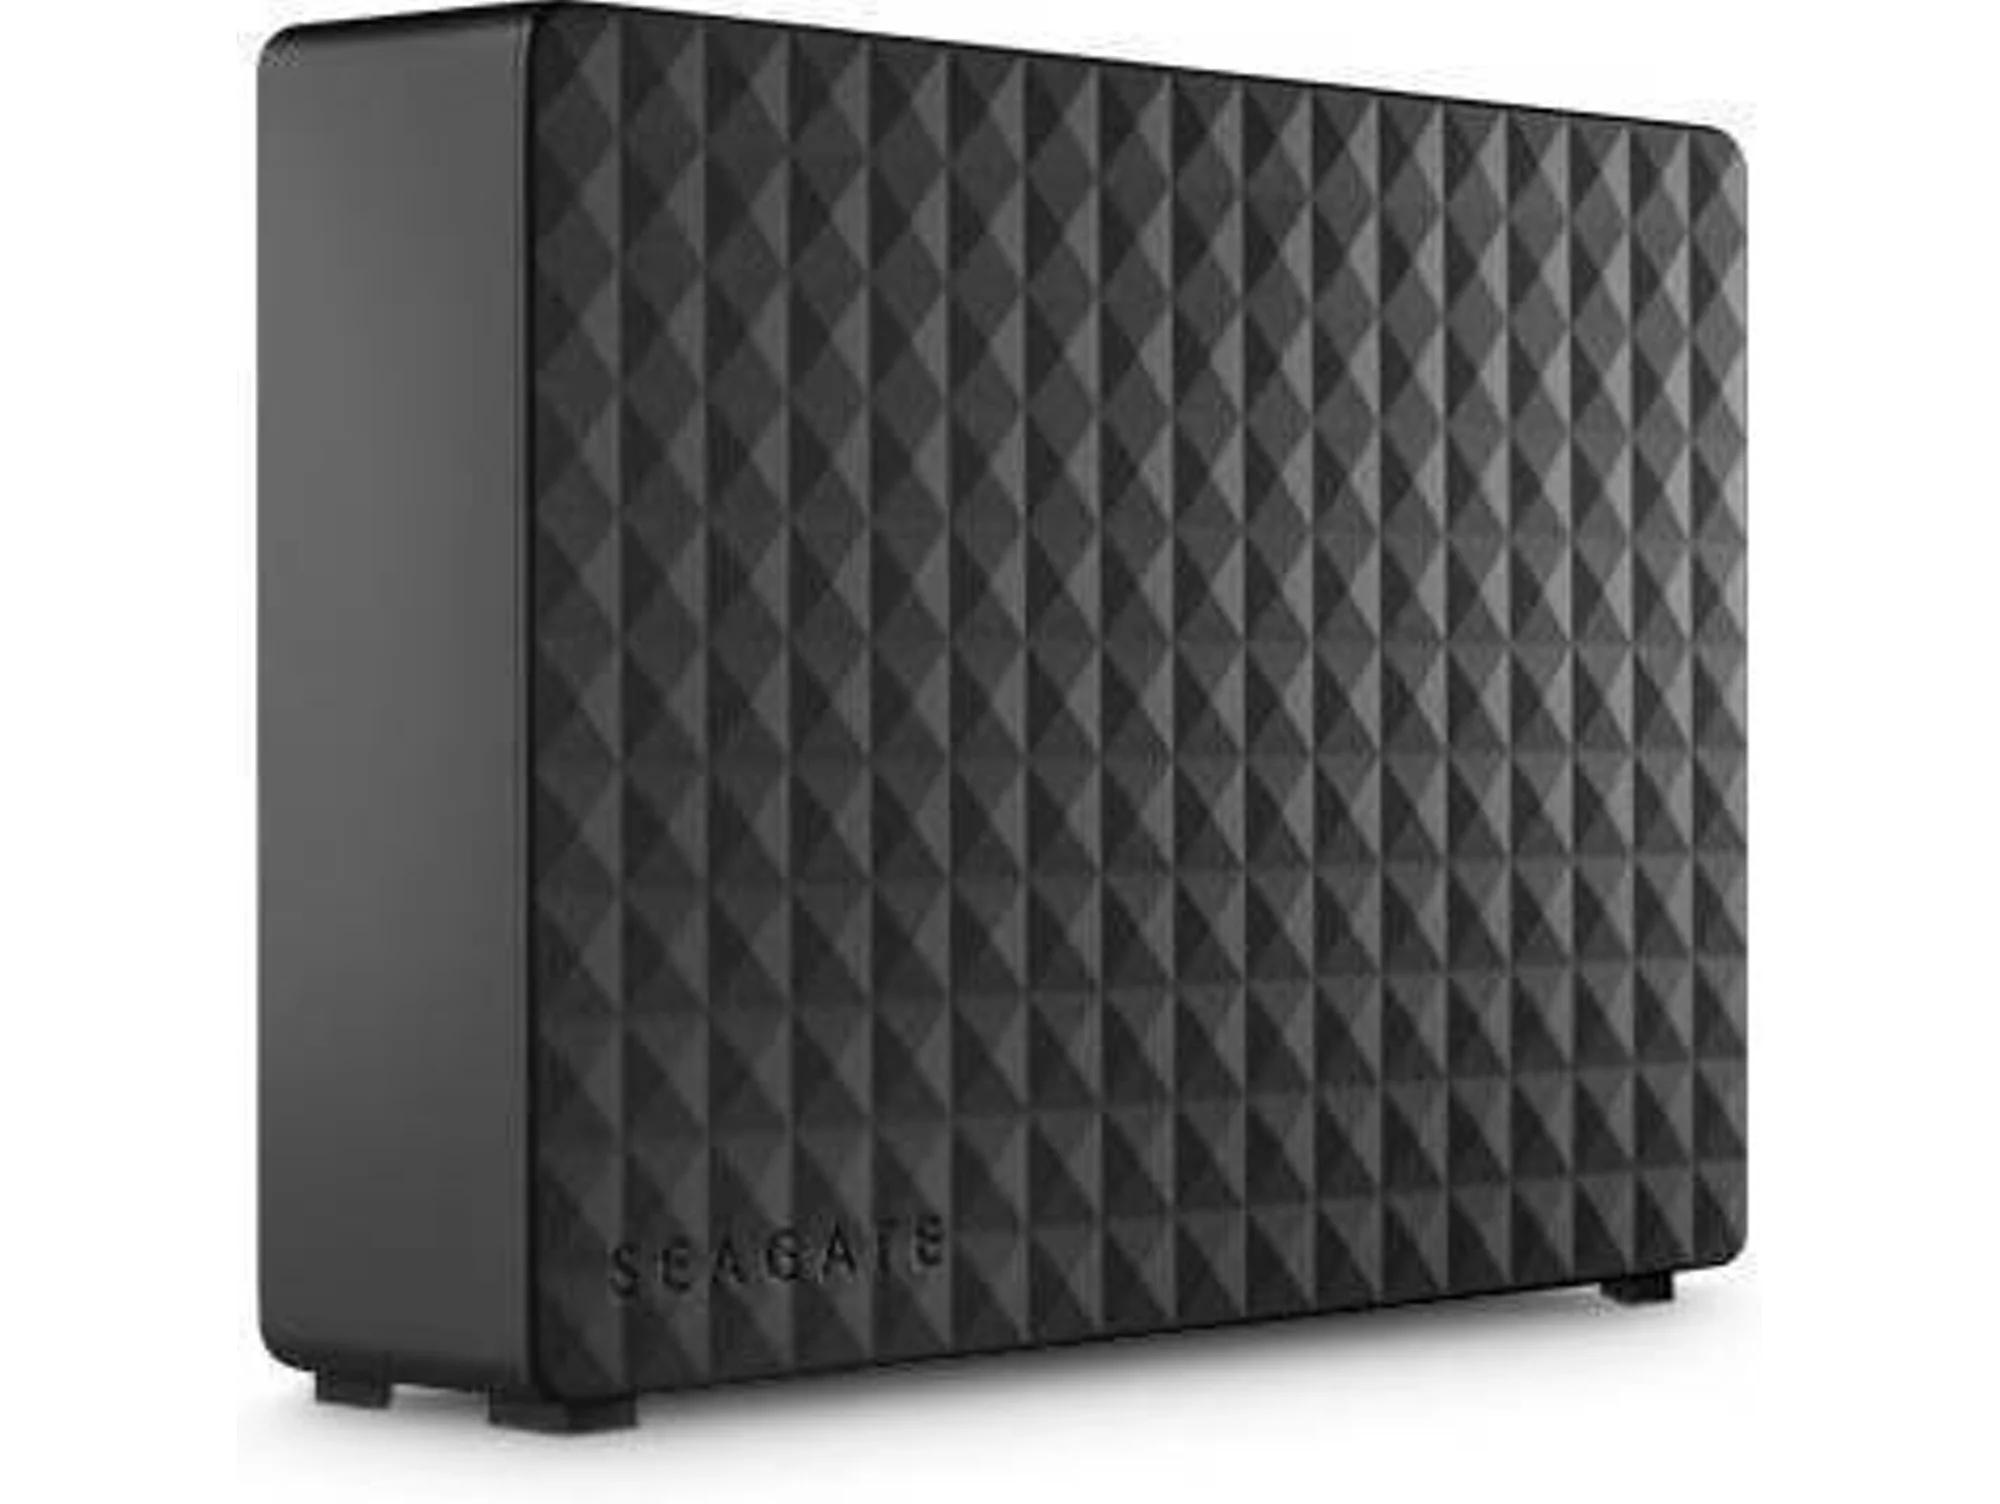 Seagate 6 TB Disco Duro Externo